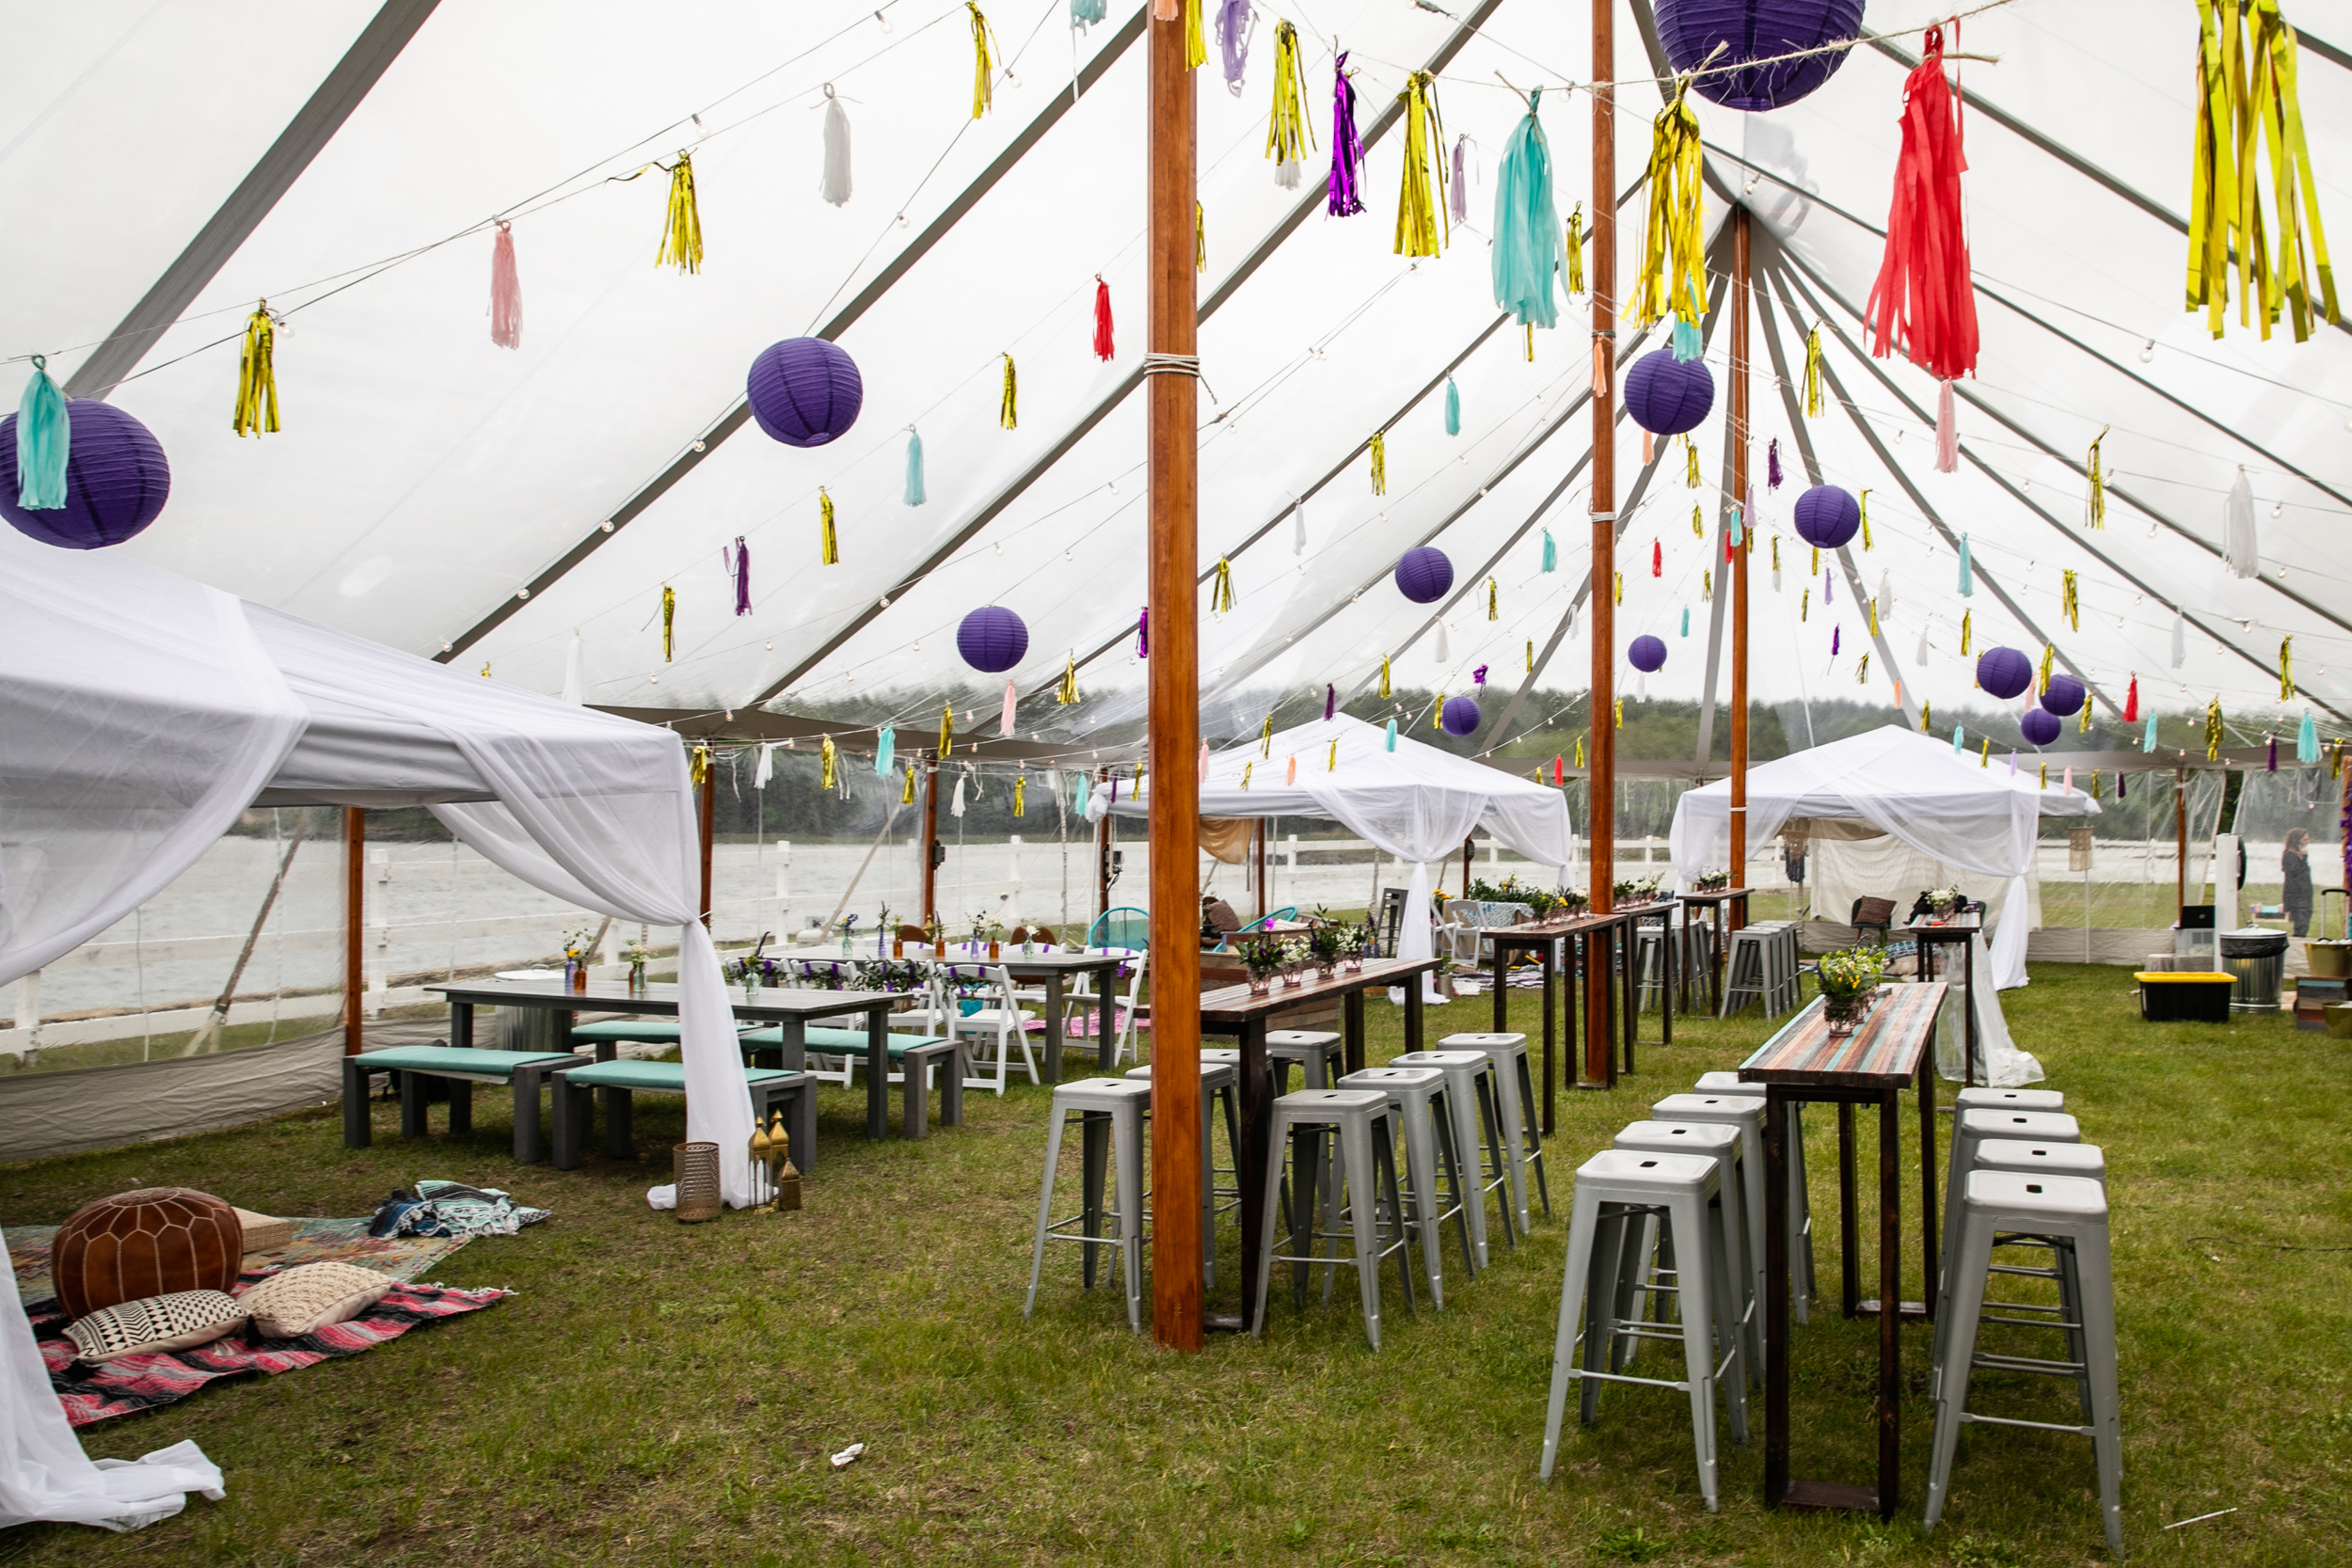 Coachella_Graduation_Party_Malloy_Events_Production